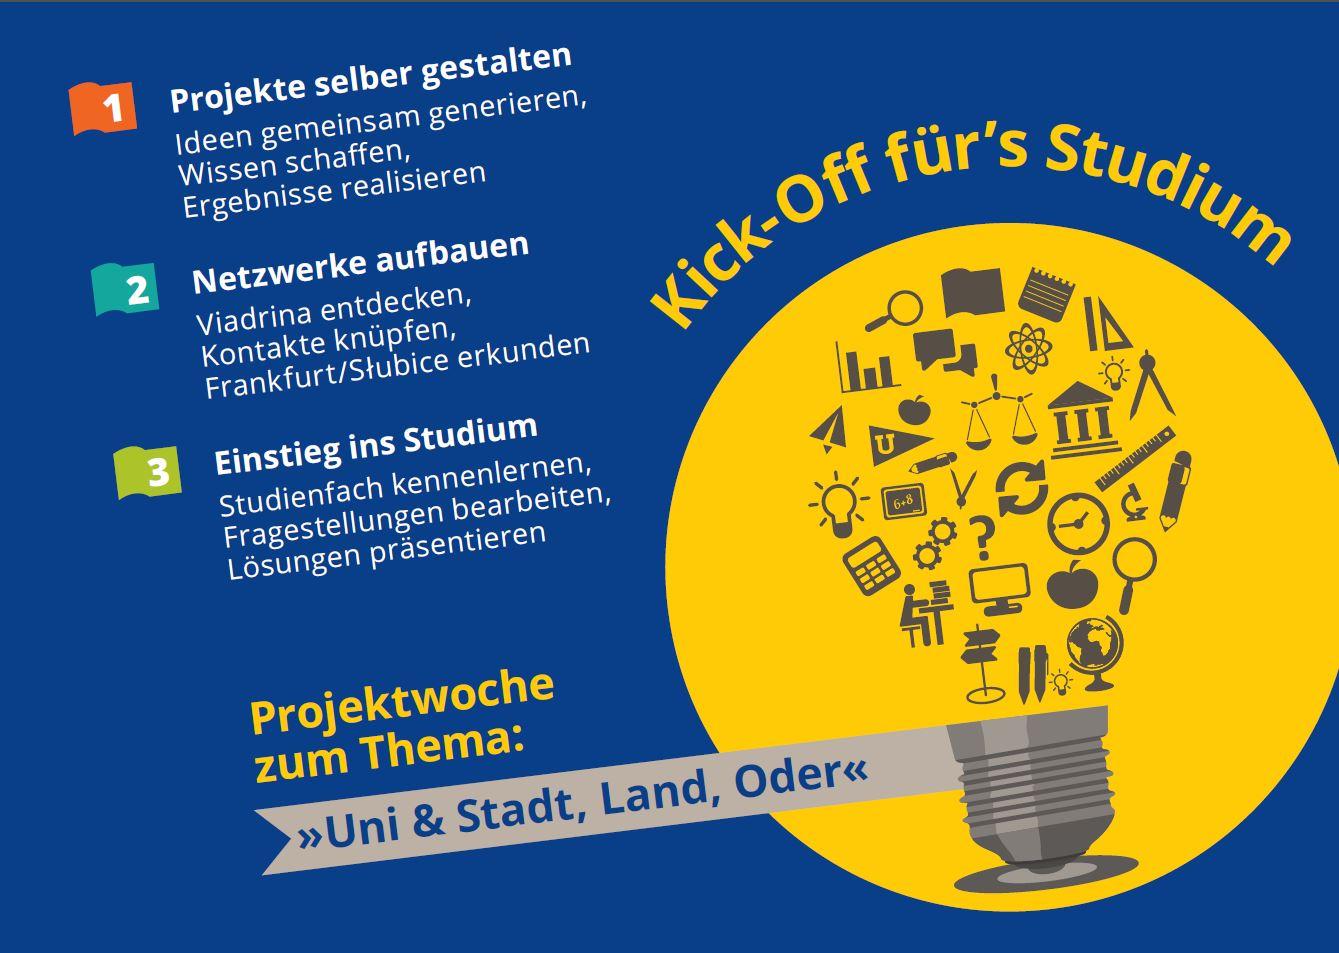 Course Image Kick-Off für's Studium - Projektwoche